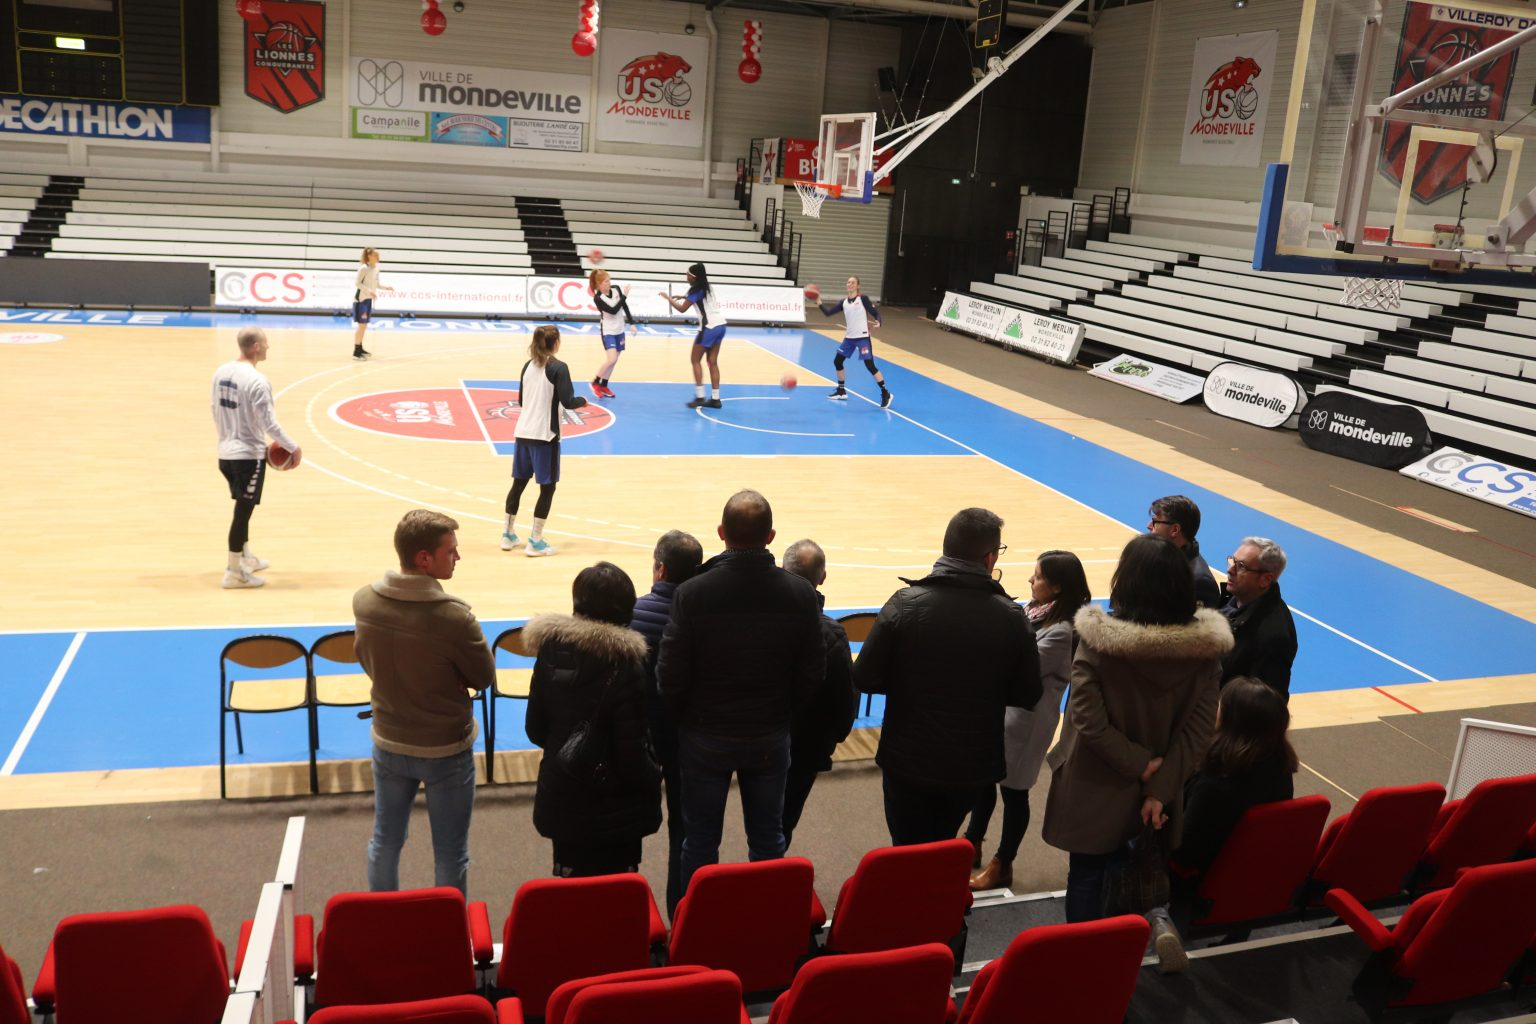 USO MONDEVILLE Basket club du sport